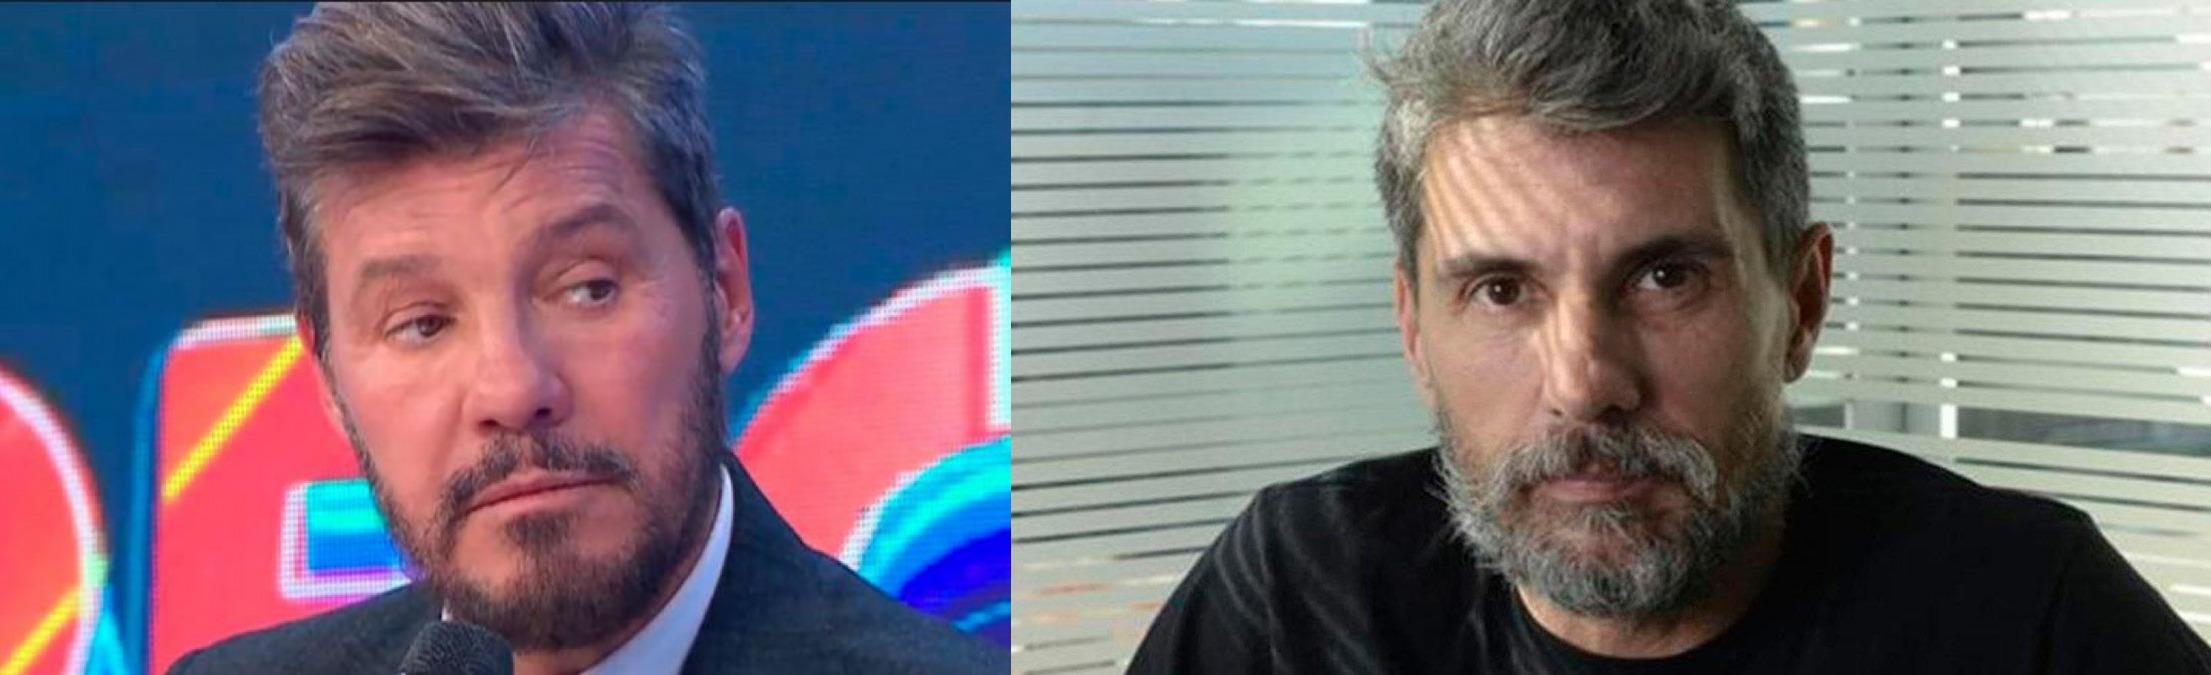 Chato Prada y Marcelo Tinelli